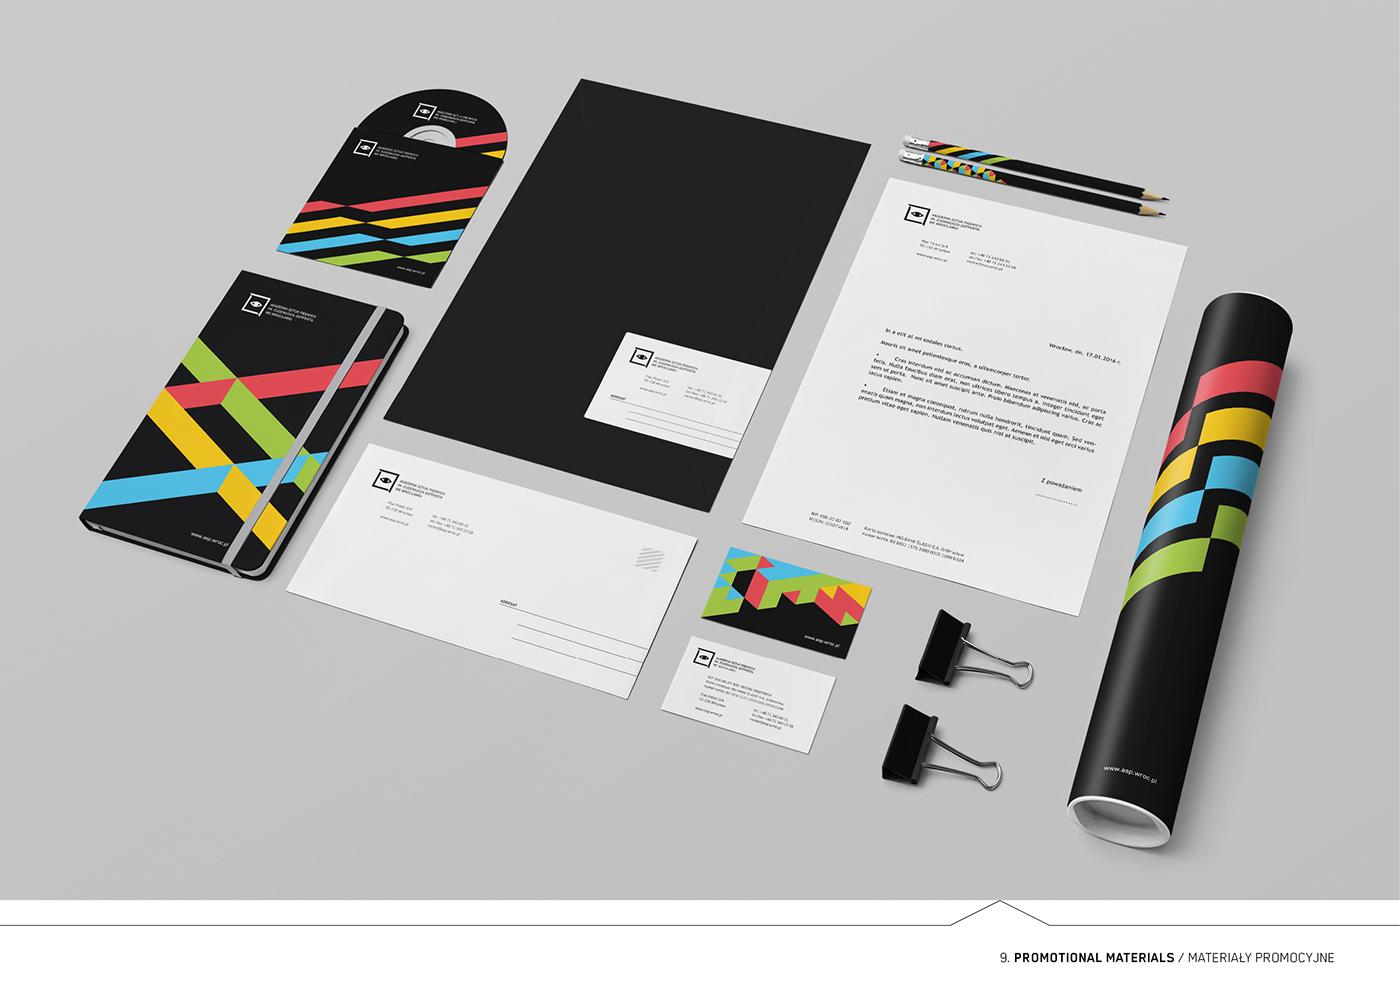 academy school fine arts art branding  wroclaw elegant rebranding design